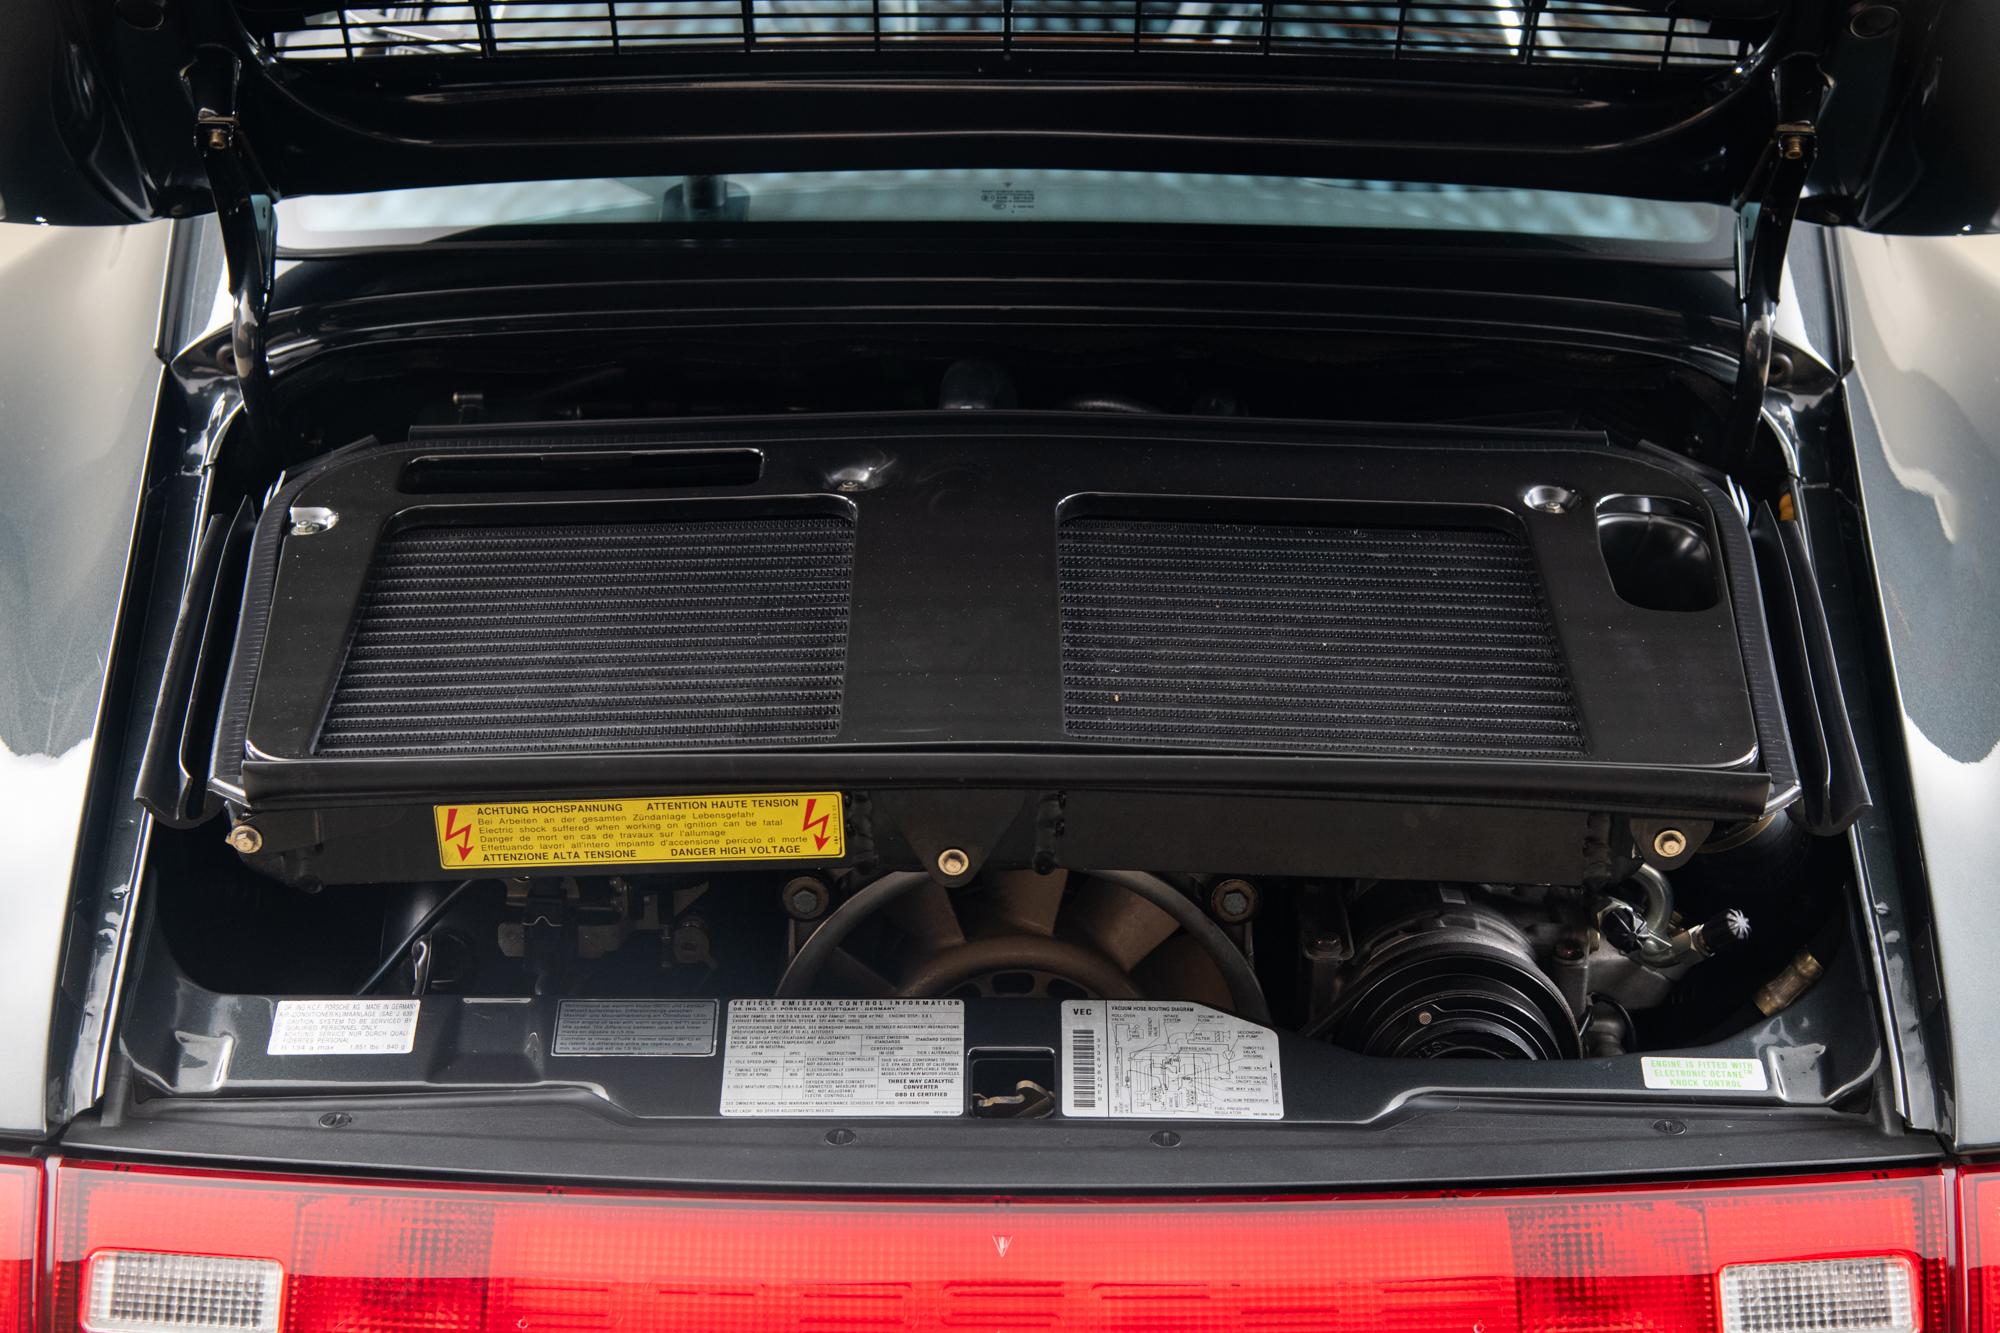 1996 Porsche 993 Turbo , DARK GRAY METALLIC, VIN WP0AC2991TS376188, MILEAGE 15091